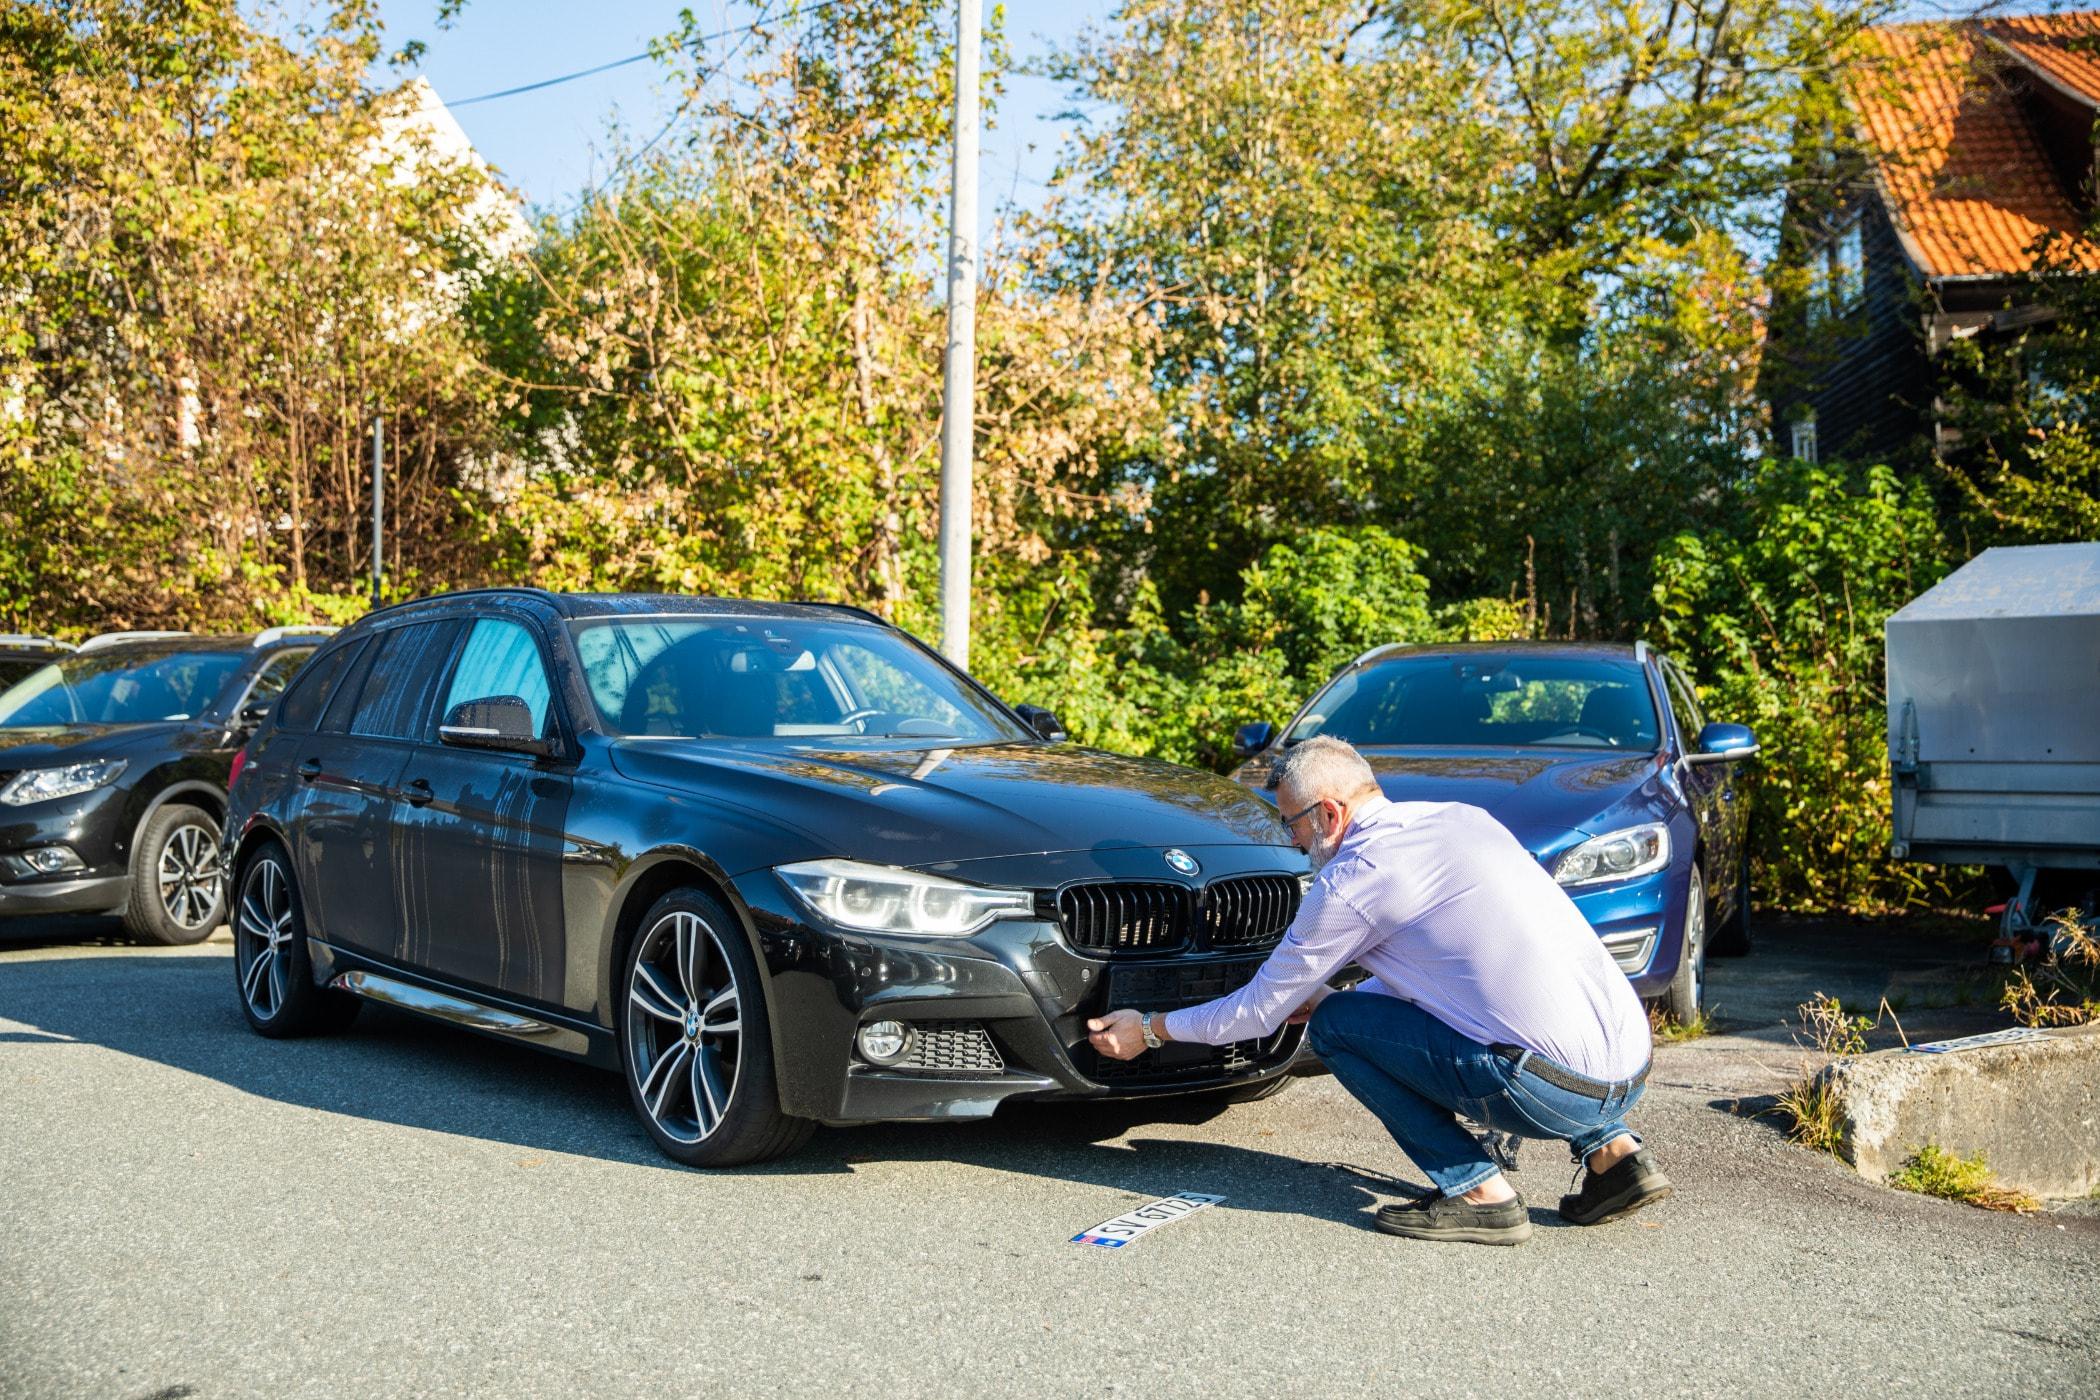 Personal luxury car, Sports sedan, Automotive design, Motor vehicle, Wheel, Transport